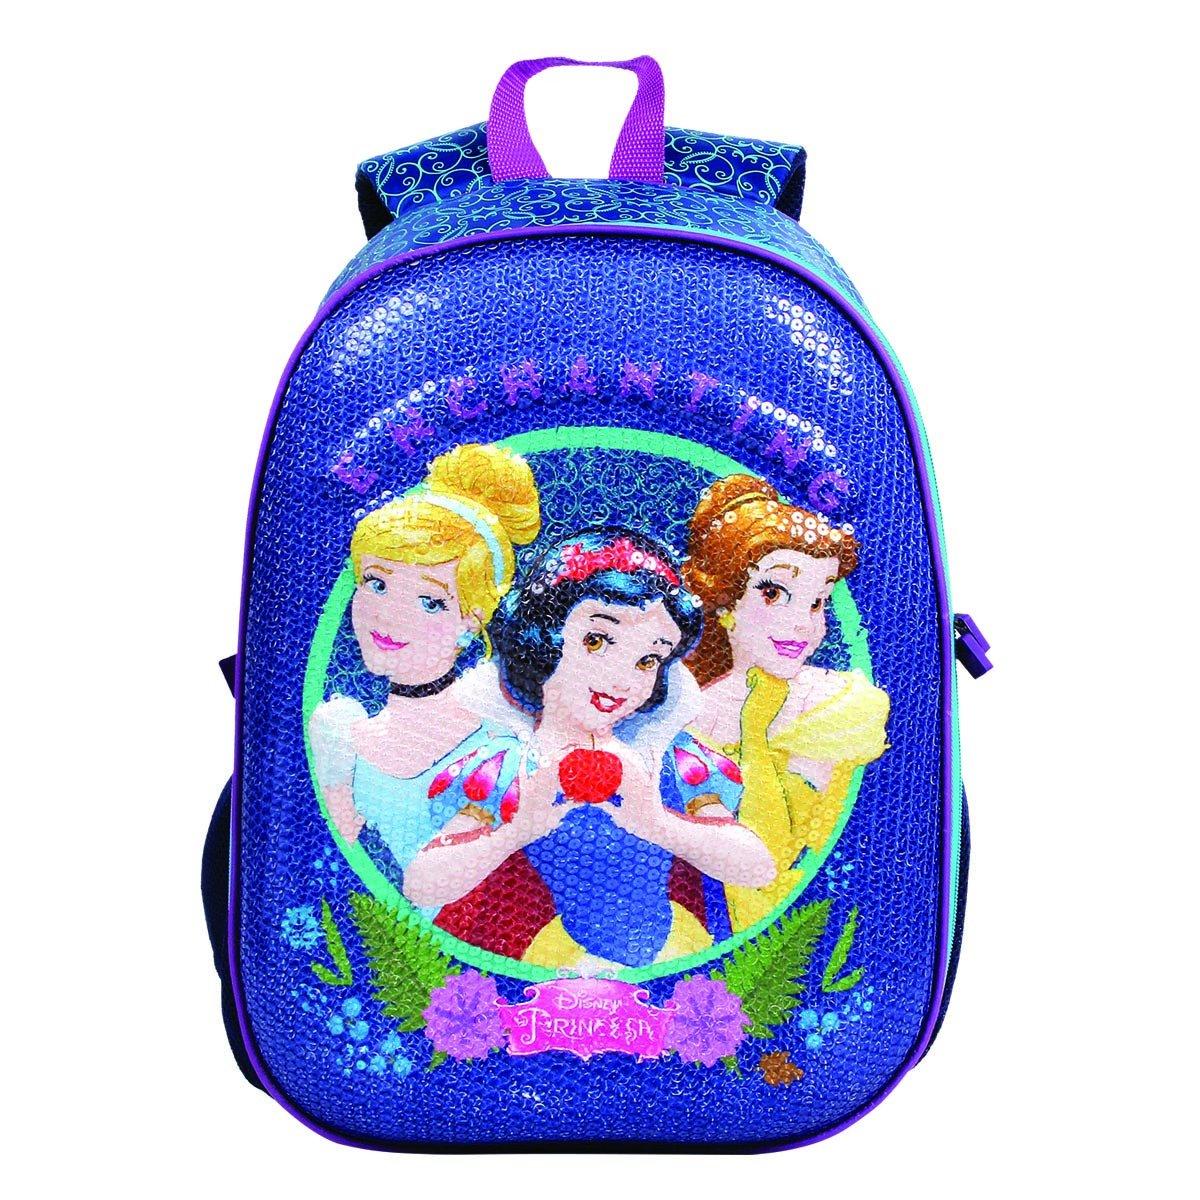 Mochila Princesas Disney 3D Paete   Cor: Azul